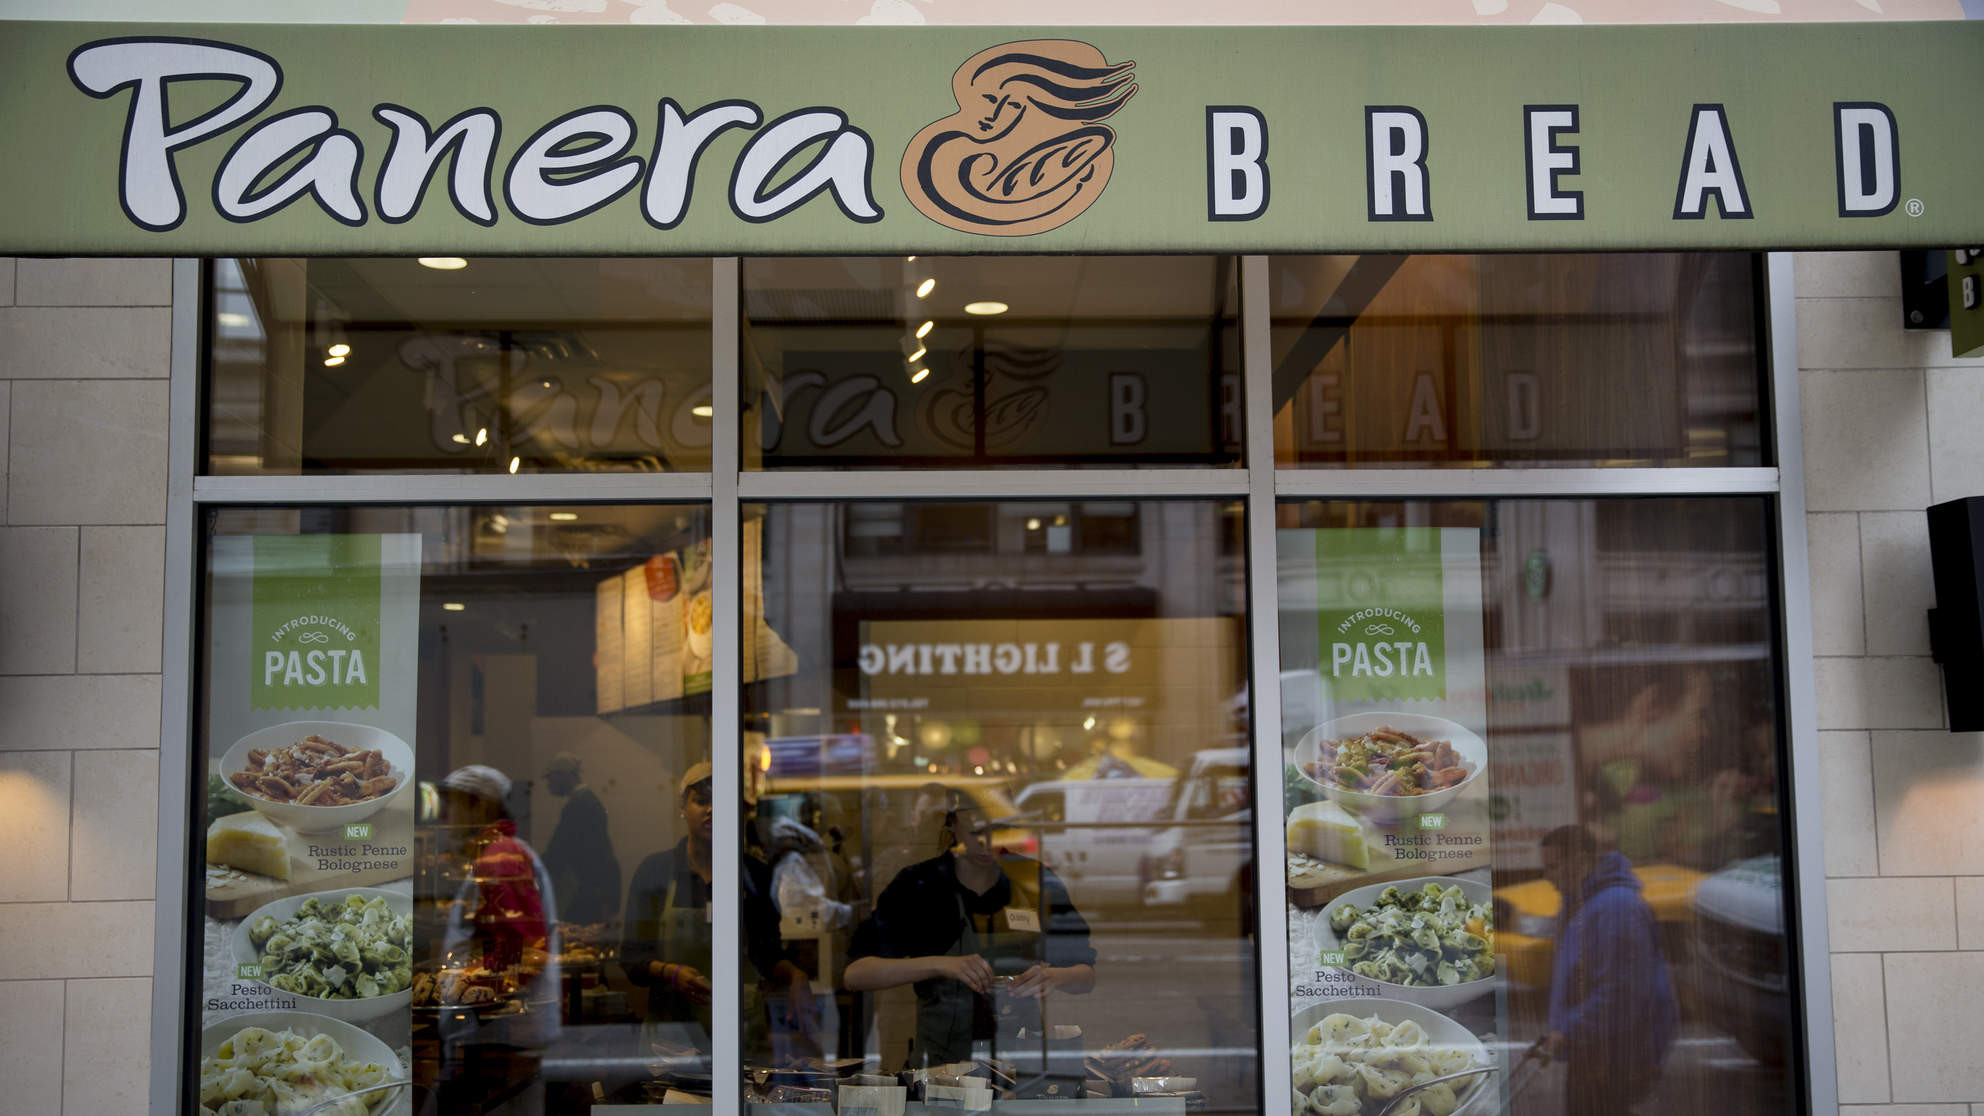 Panera Bread Healthy Choice  The Healthiest Sandwich Choices at Panera Bread Health